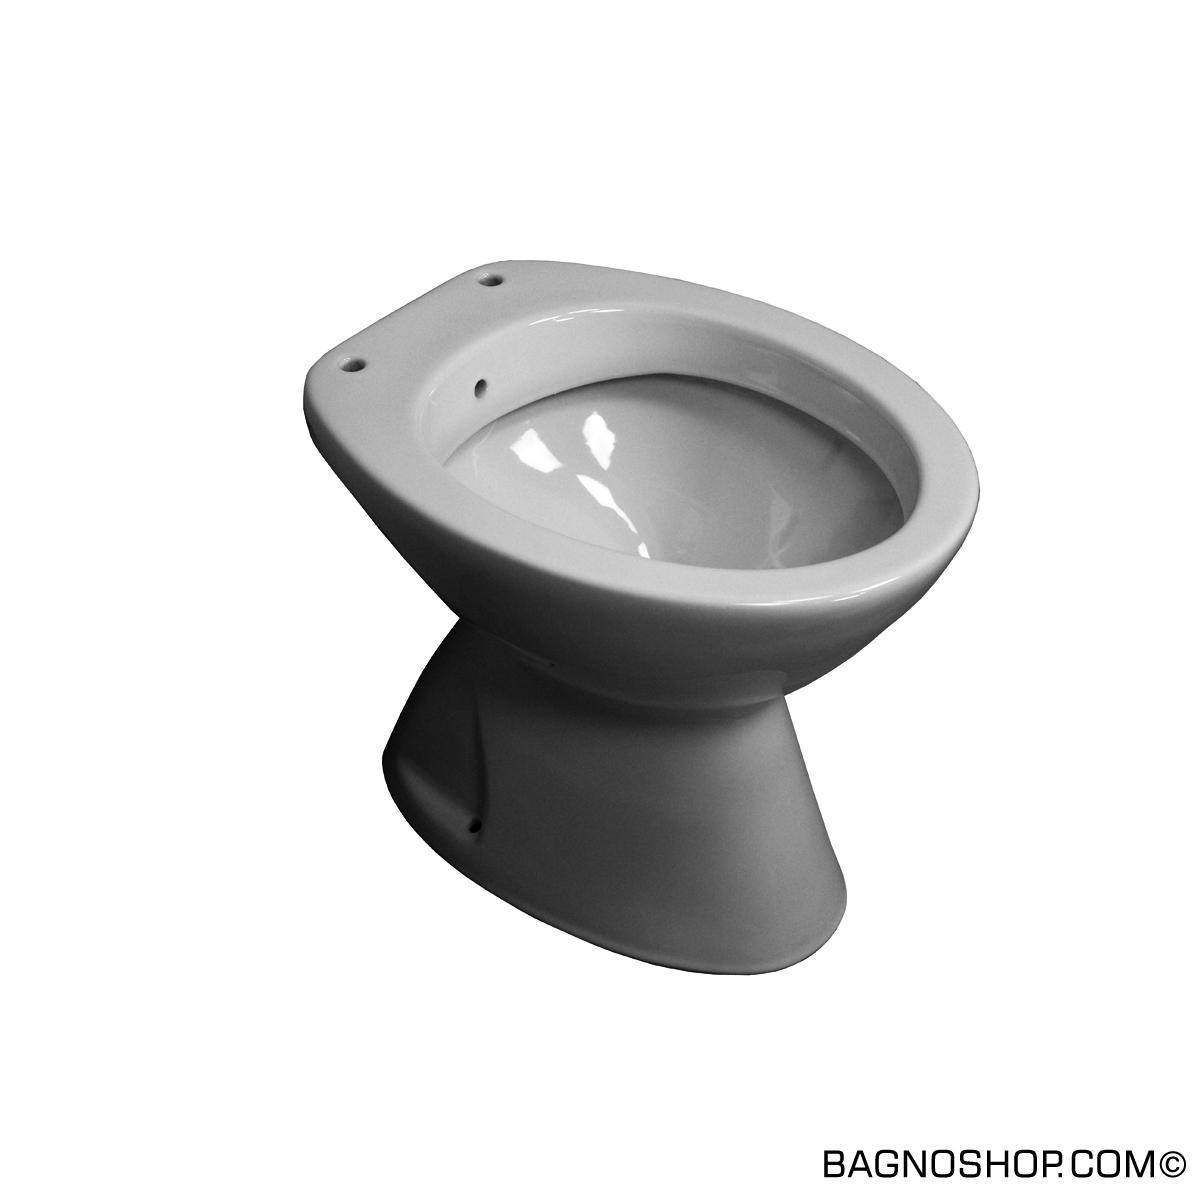 Water bidet integrato iseo for Wc bidet integrato